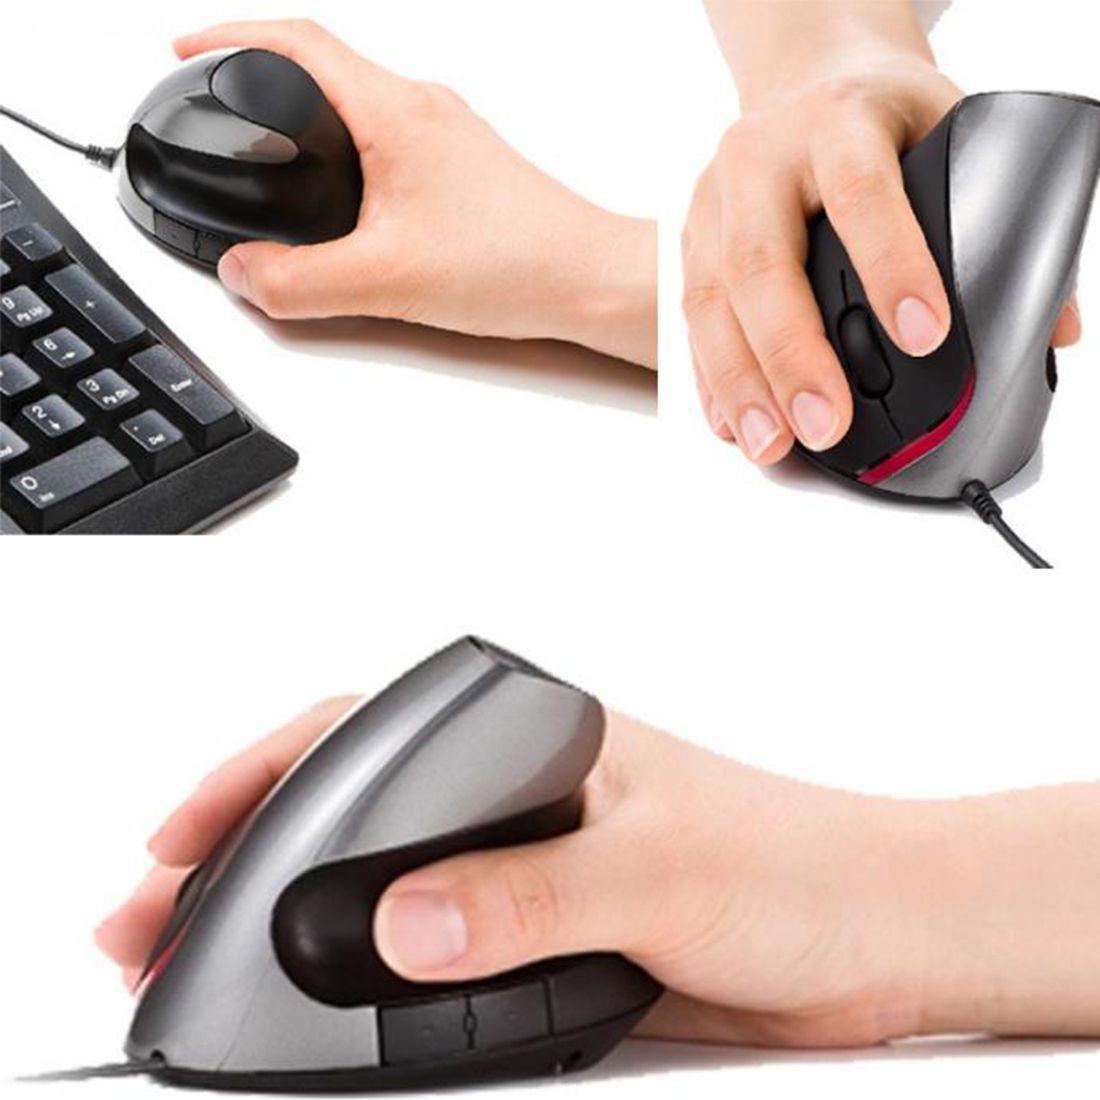 Etmakit New Ergonomic Design USB Vertical Optical Mouse Wrist Healing For Computer PC Laptop Desktop